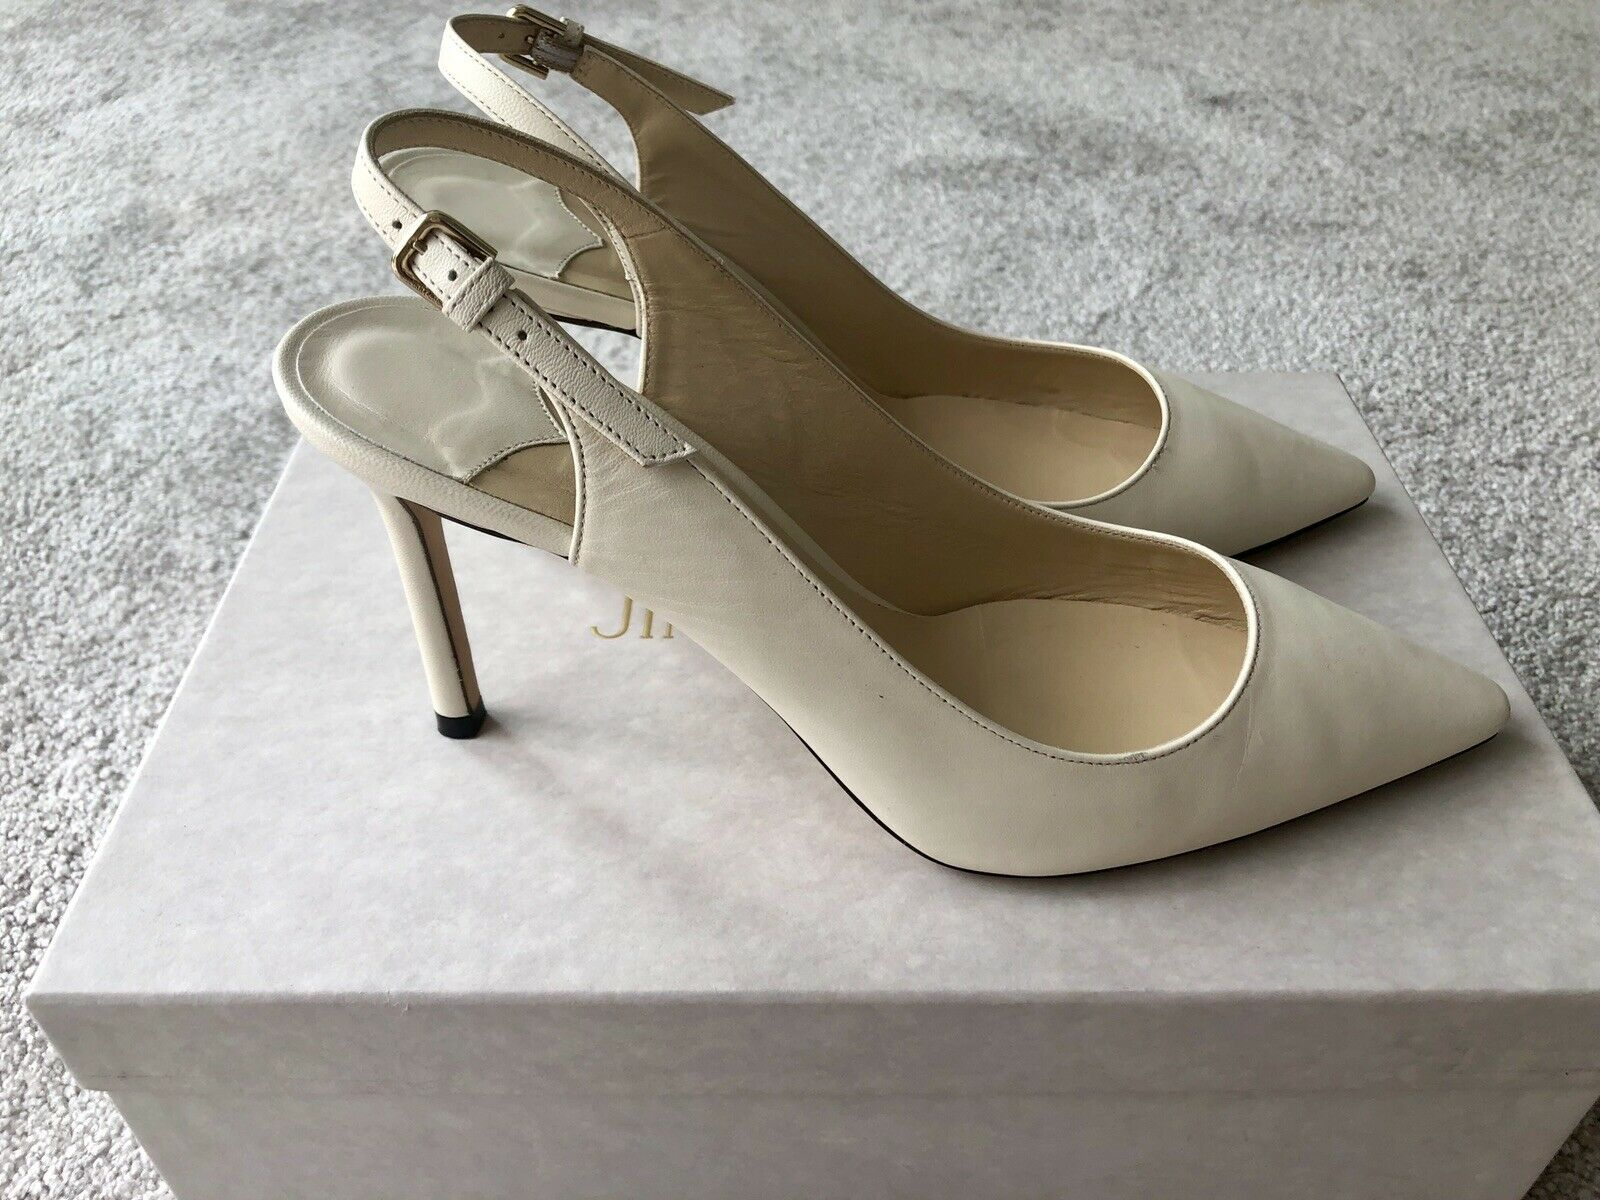 Details zu Zara Leder Wildleder Pumps Gr. 41 Weiß wollweiß Peeptoes Damen Schuhe NEU